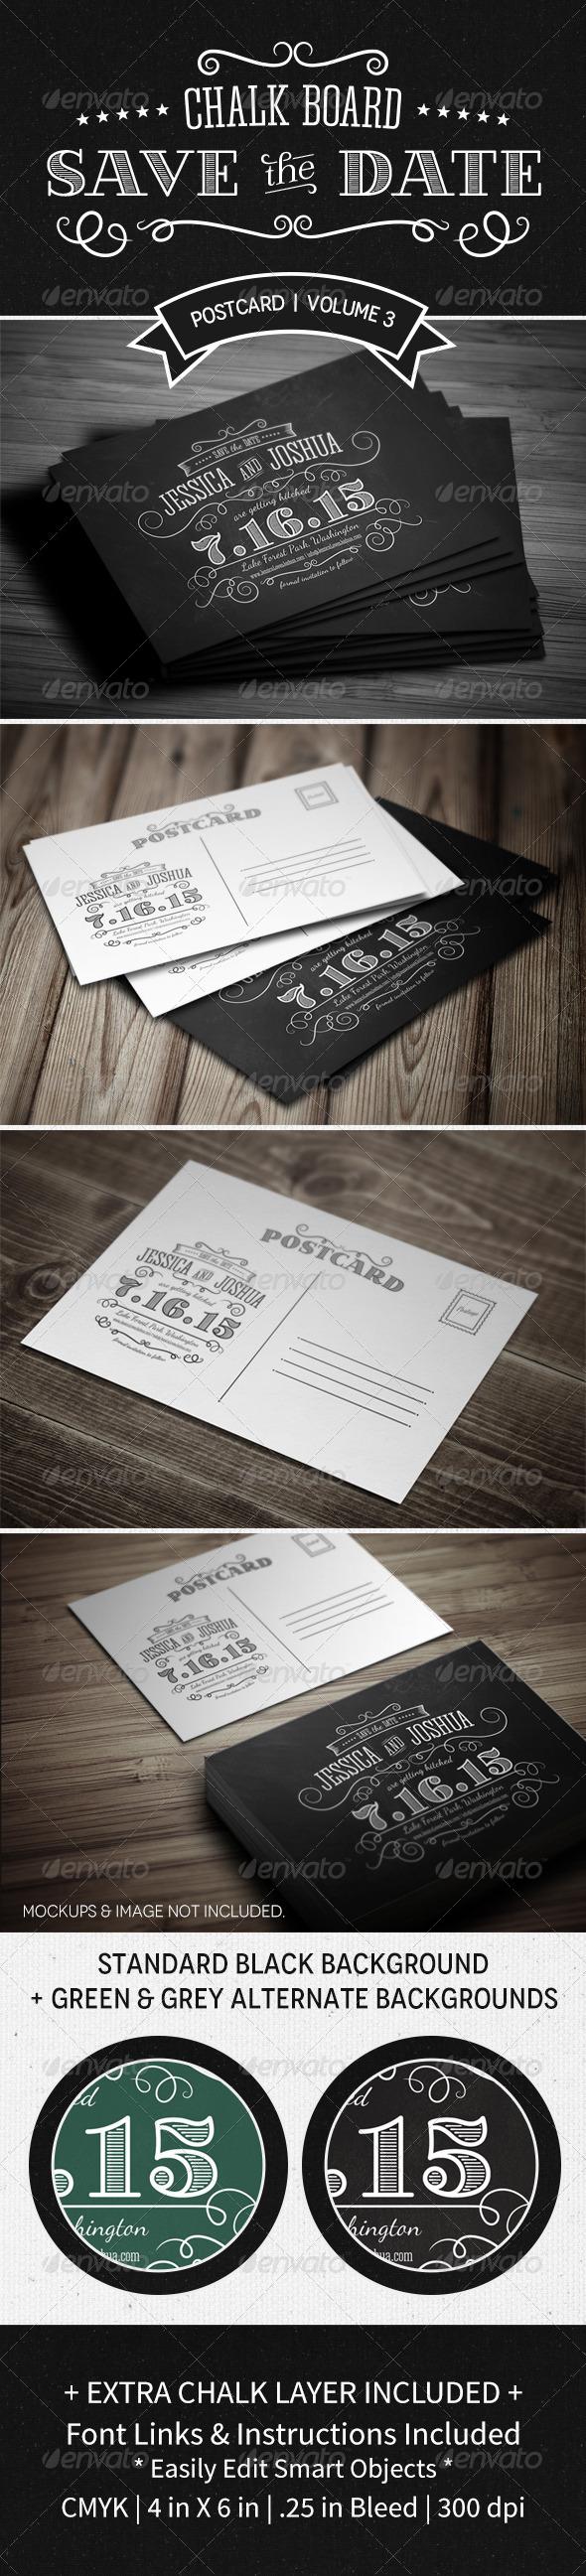 Save The Date Postcard   Volume 3   Chalkboard by MakeMediaCo ...